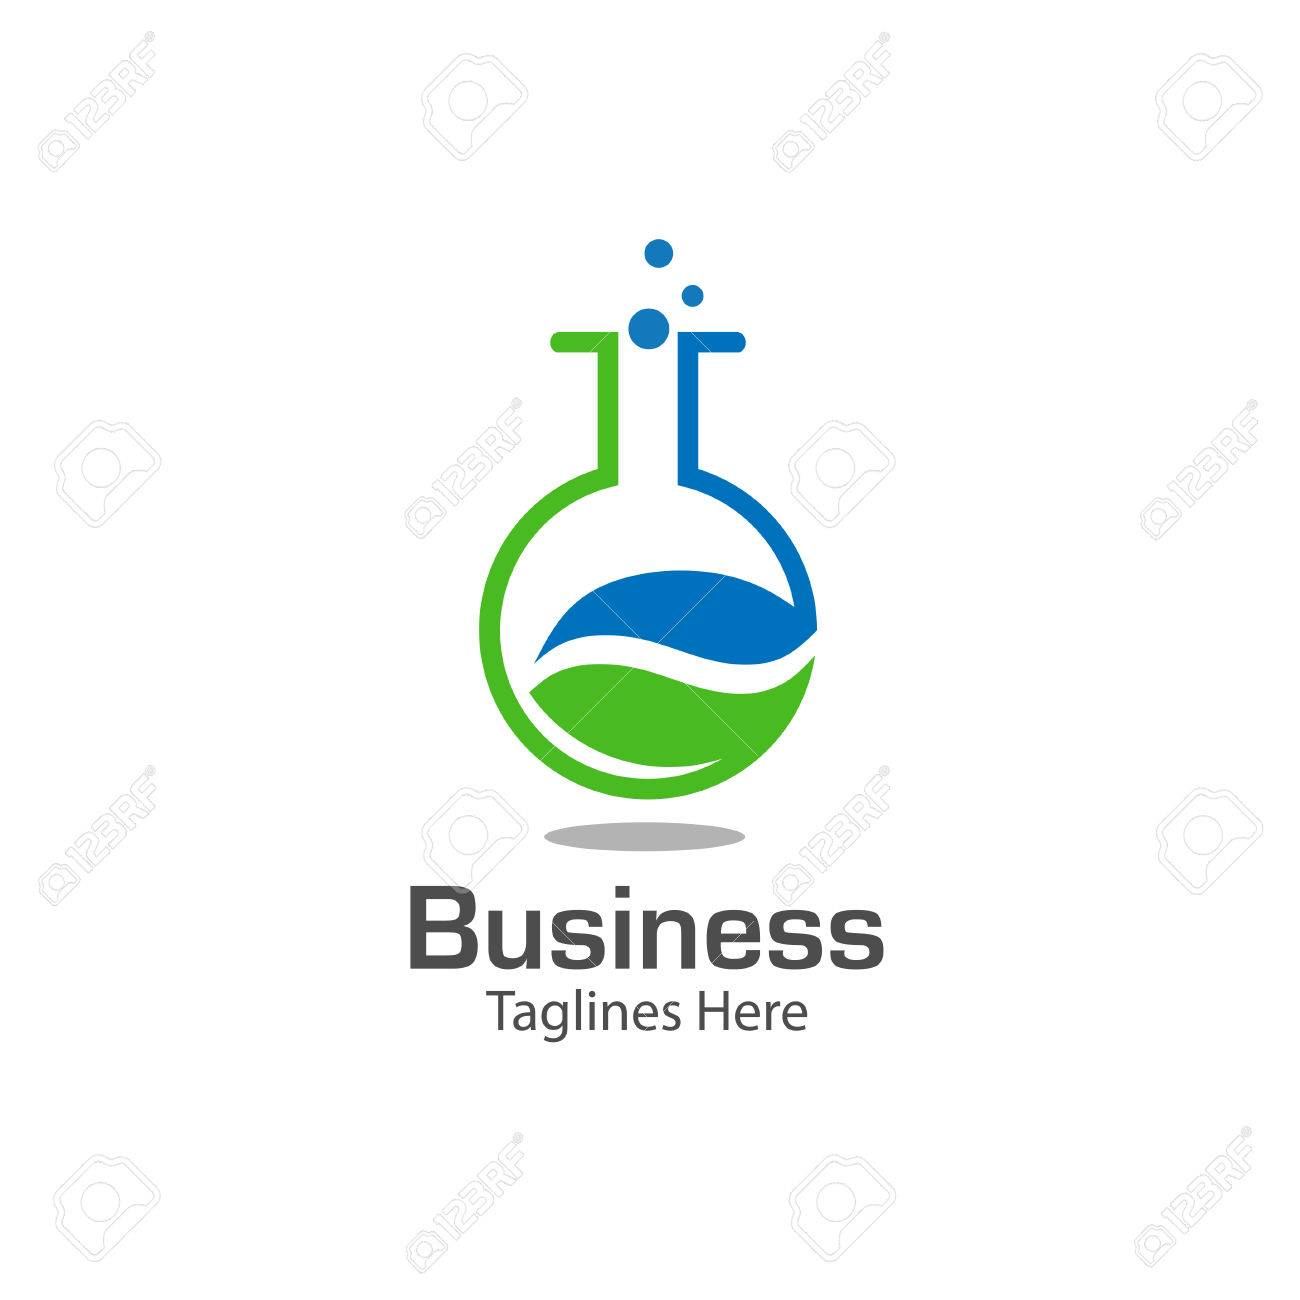 Logotipo De Laboratorio Con Símbolo De La Hoja, Tubo De Ensayo De ...